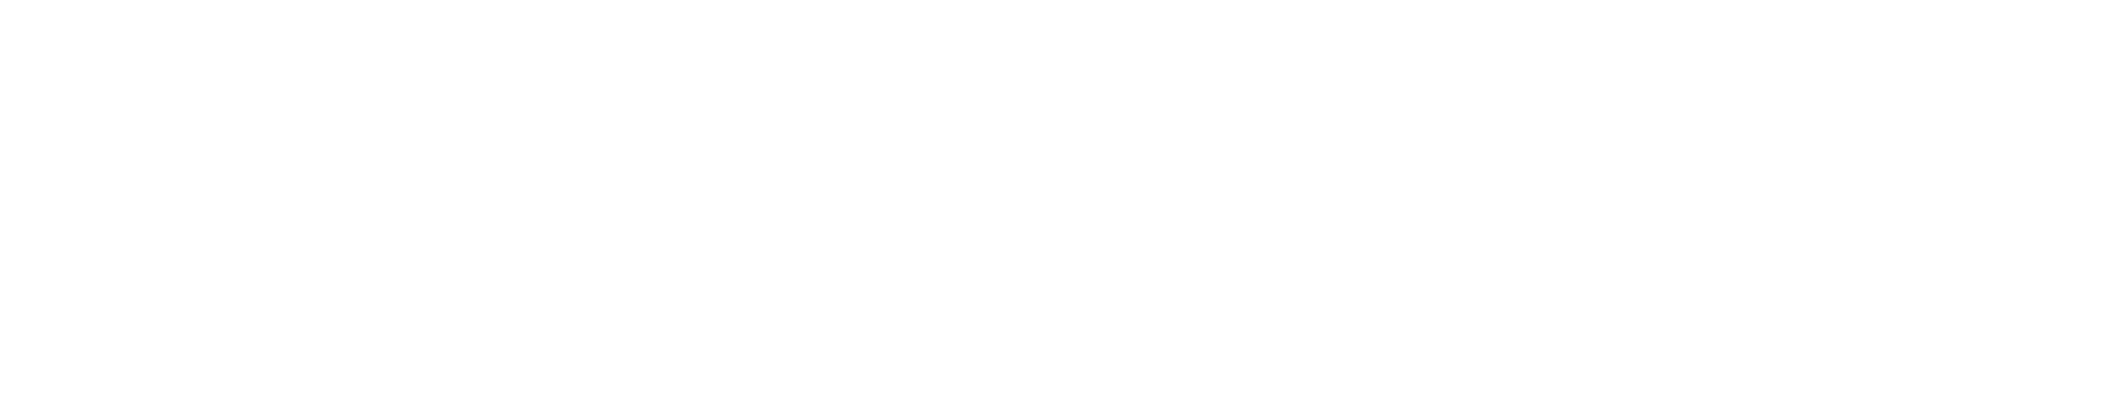 monitoring-icone